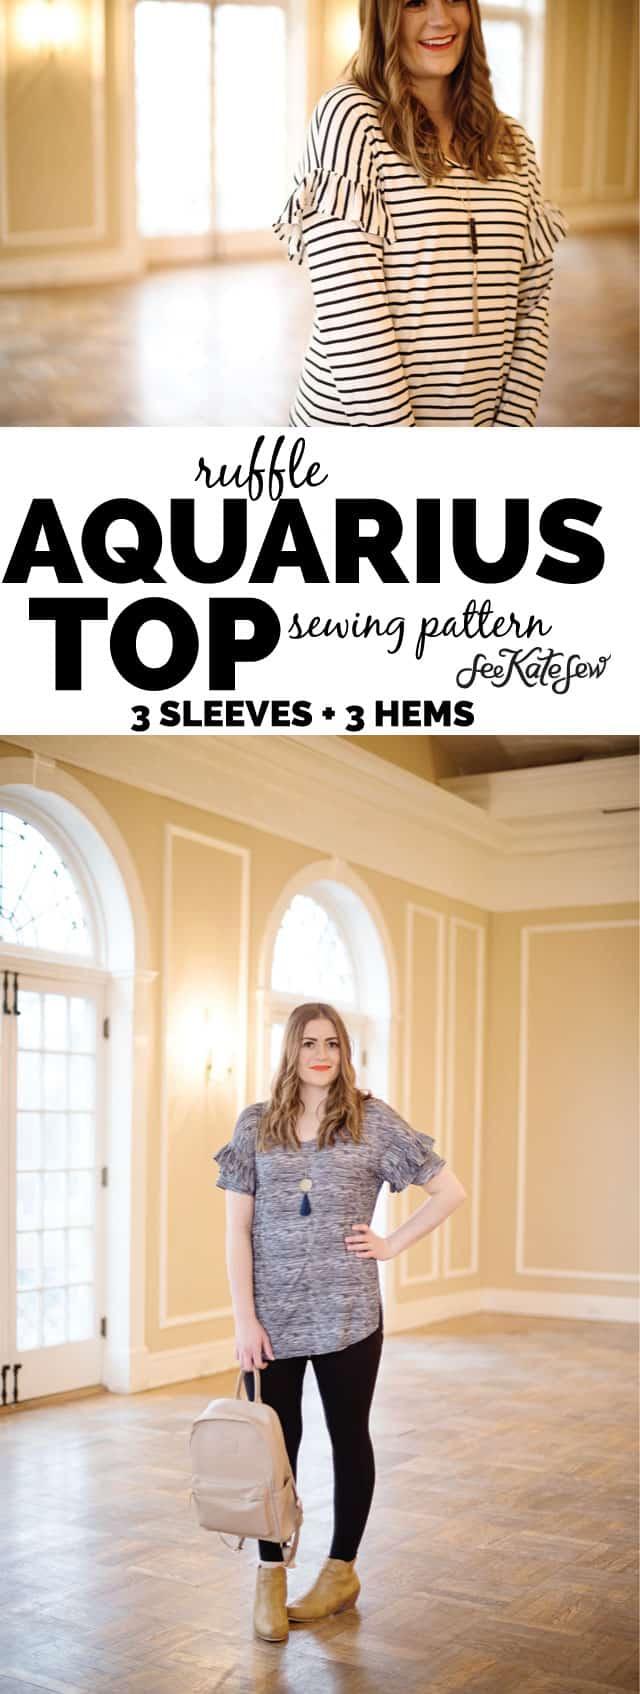 the AQUARIUS PDF PATTERN | Easy to sew!